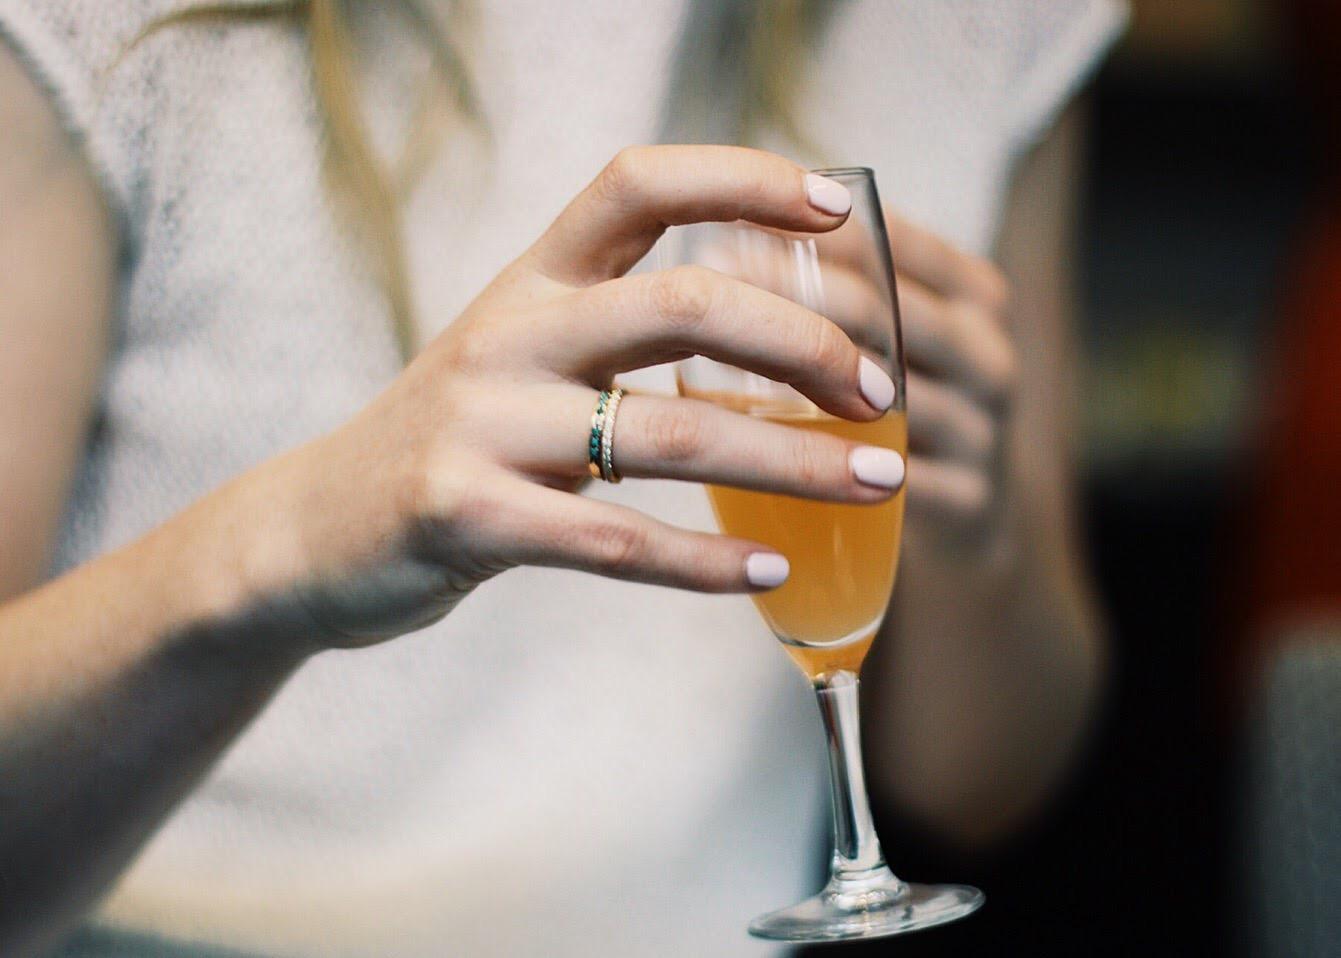 My Feminist Engagement Ring, Tiffany's diamond band, Mociun antique diamond and turquoise band Photo by Jenny Lee Photographs